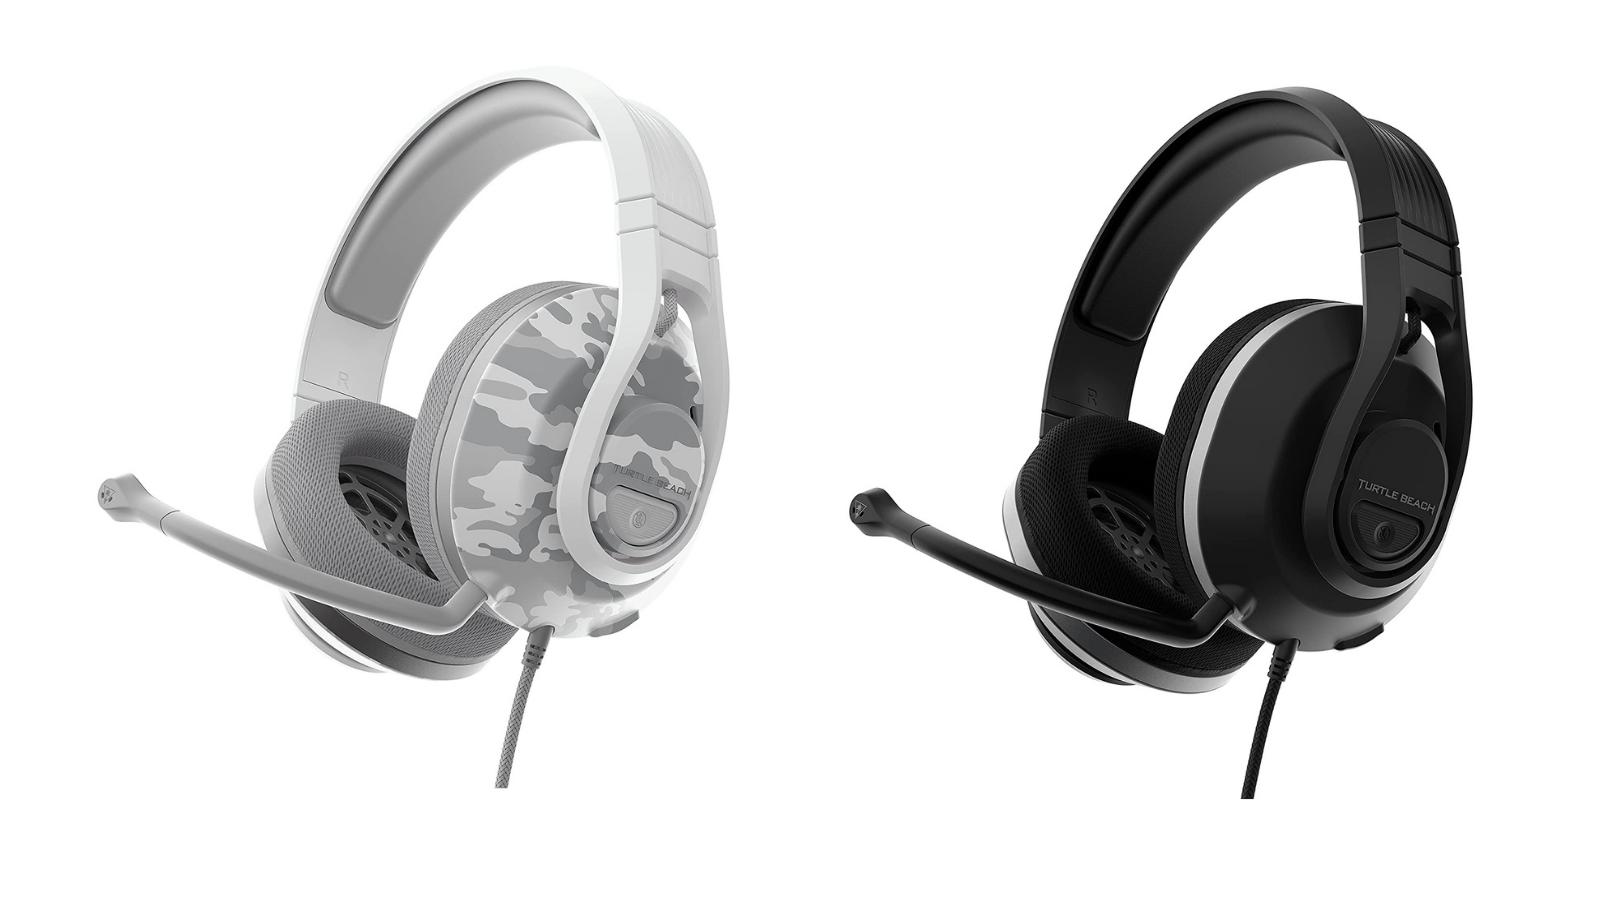 Recon 500 Wired Multiplatform Gaming Headset